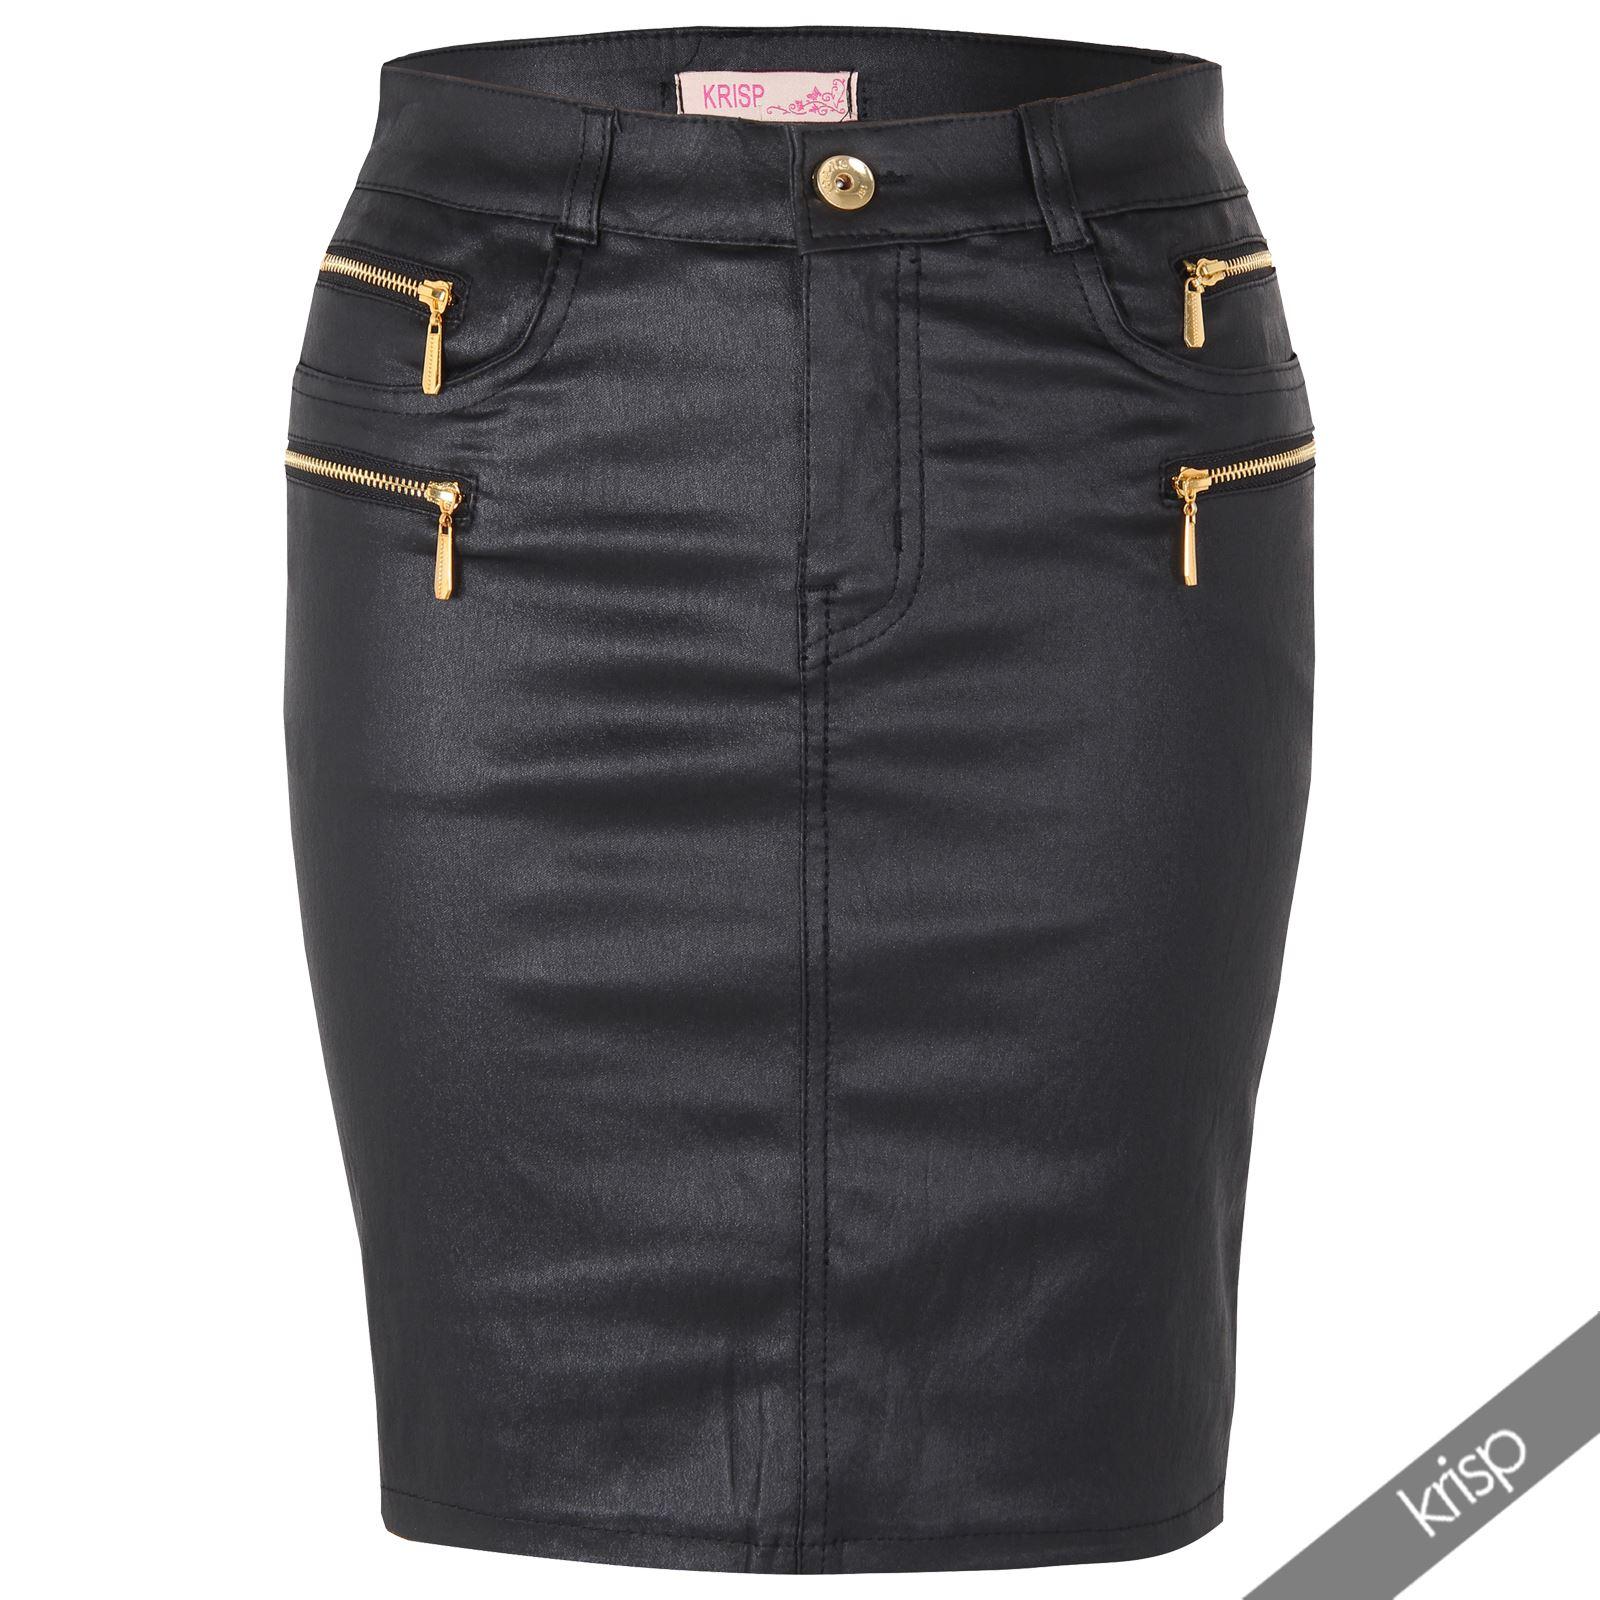 Womens girls wet look stretch denim pu leather sexy pencil bodycon mini skirt